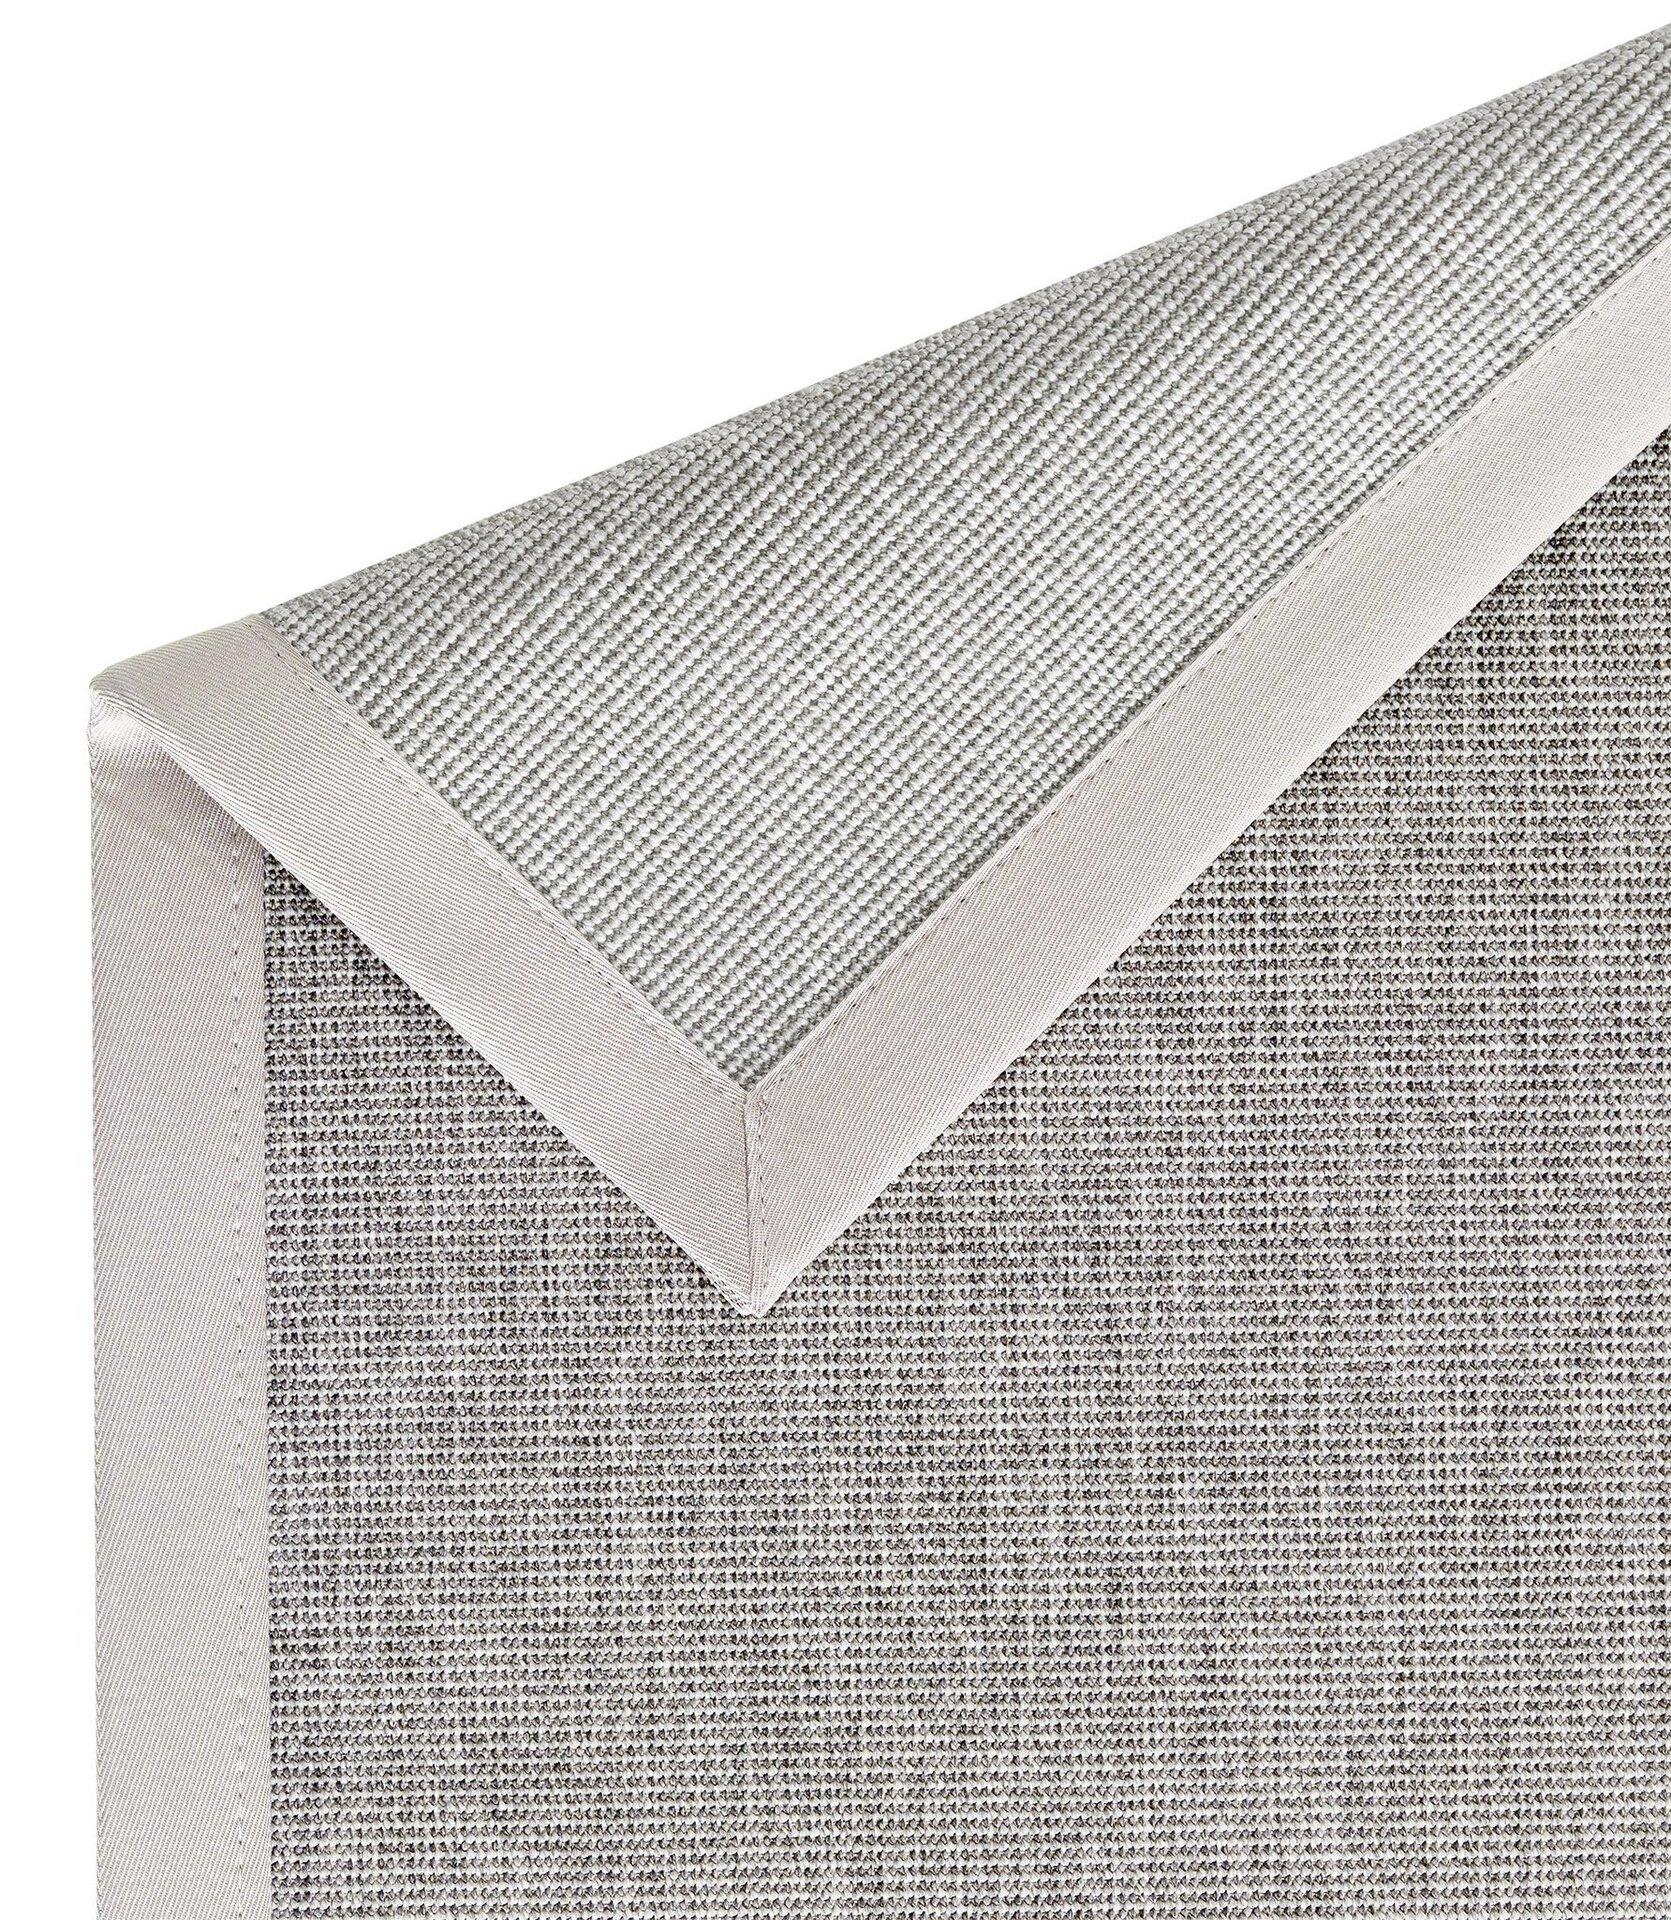 Outdoorteppich Naturino Rips DEKOWE Textil silber